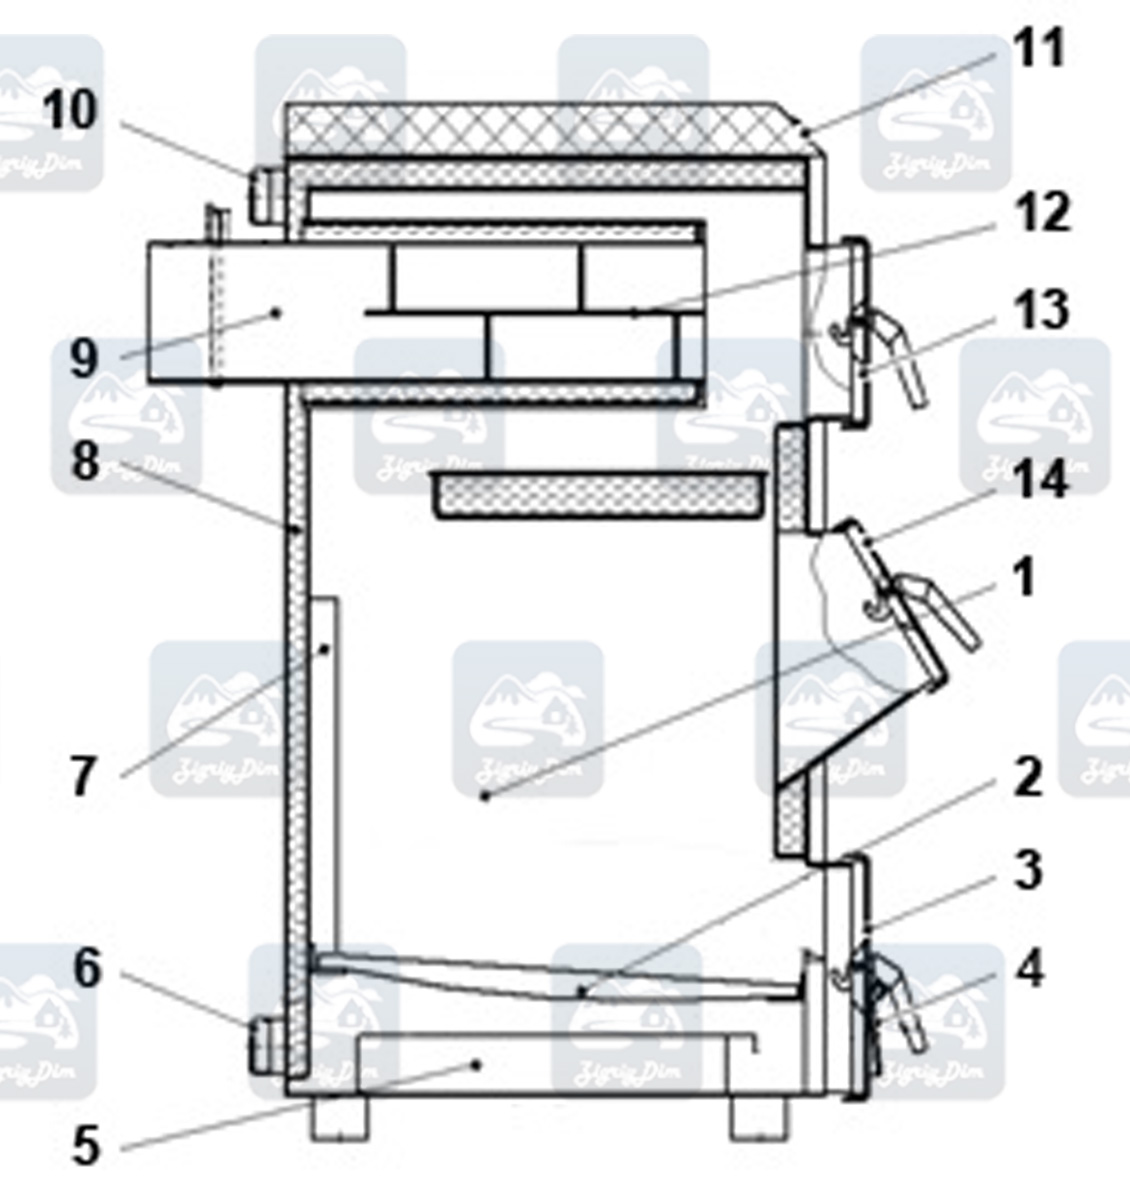 Схема твердотопливного котла на дровах и угле Корди АОТВ СТ